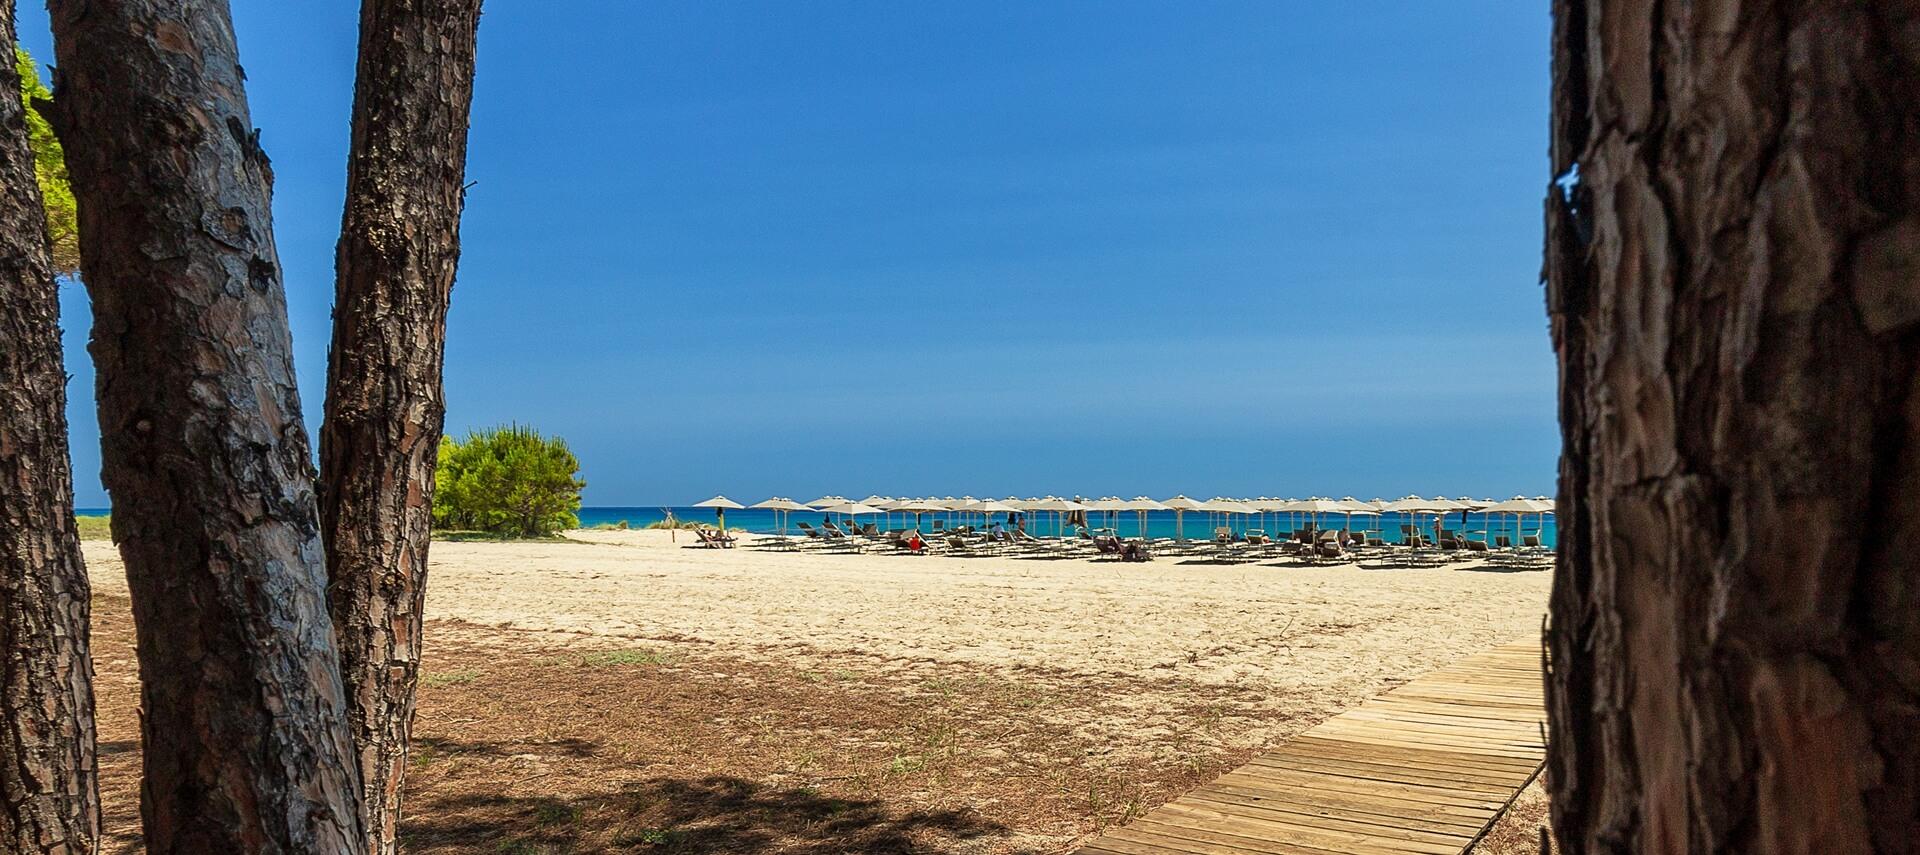 hotel_resort_sulla_spiaggia_cardedu_03